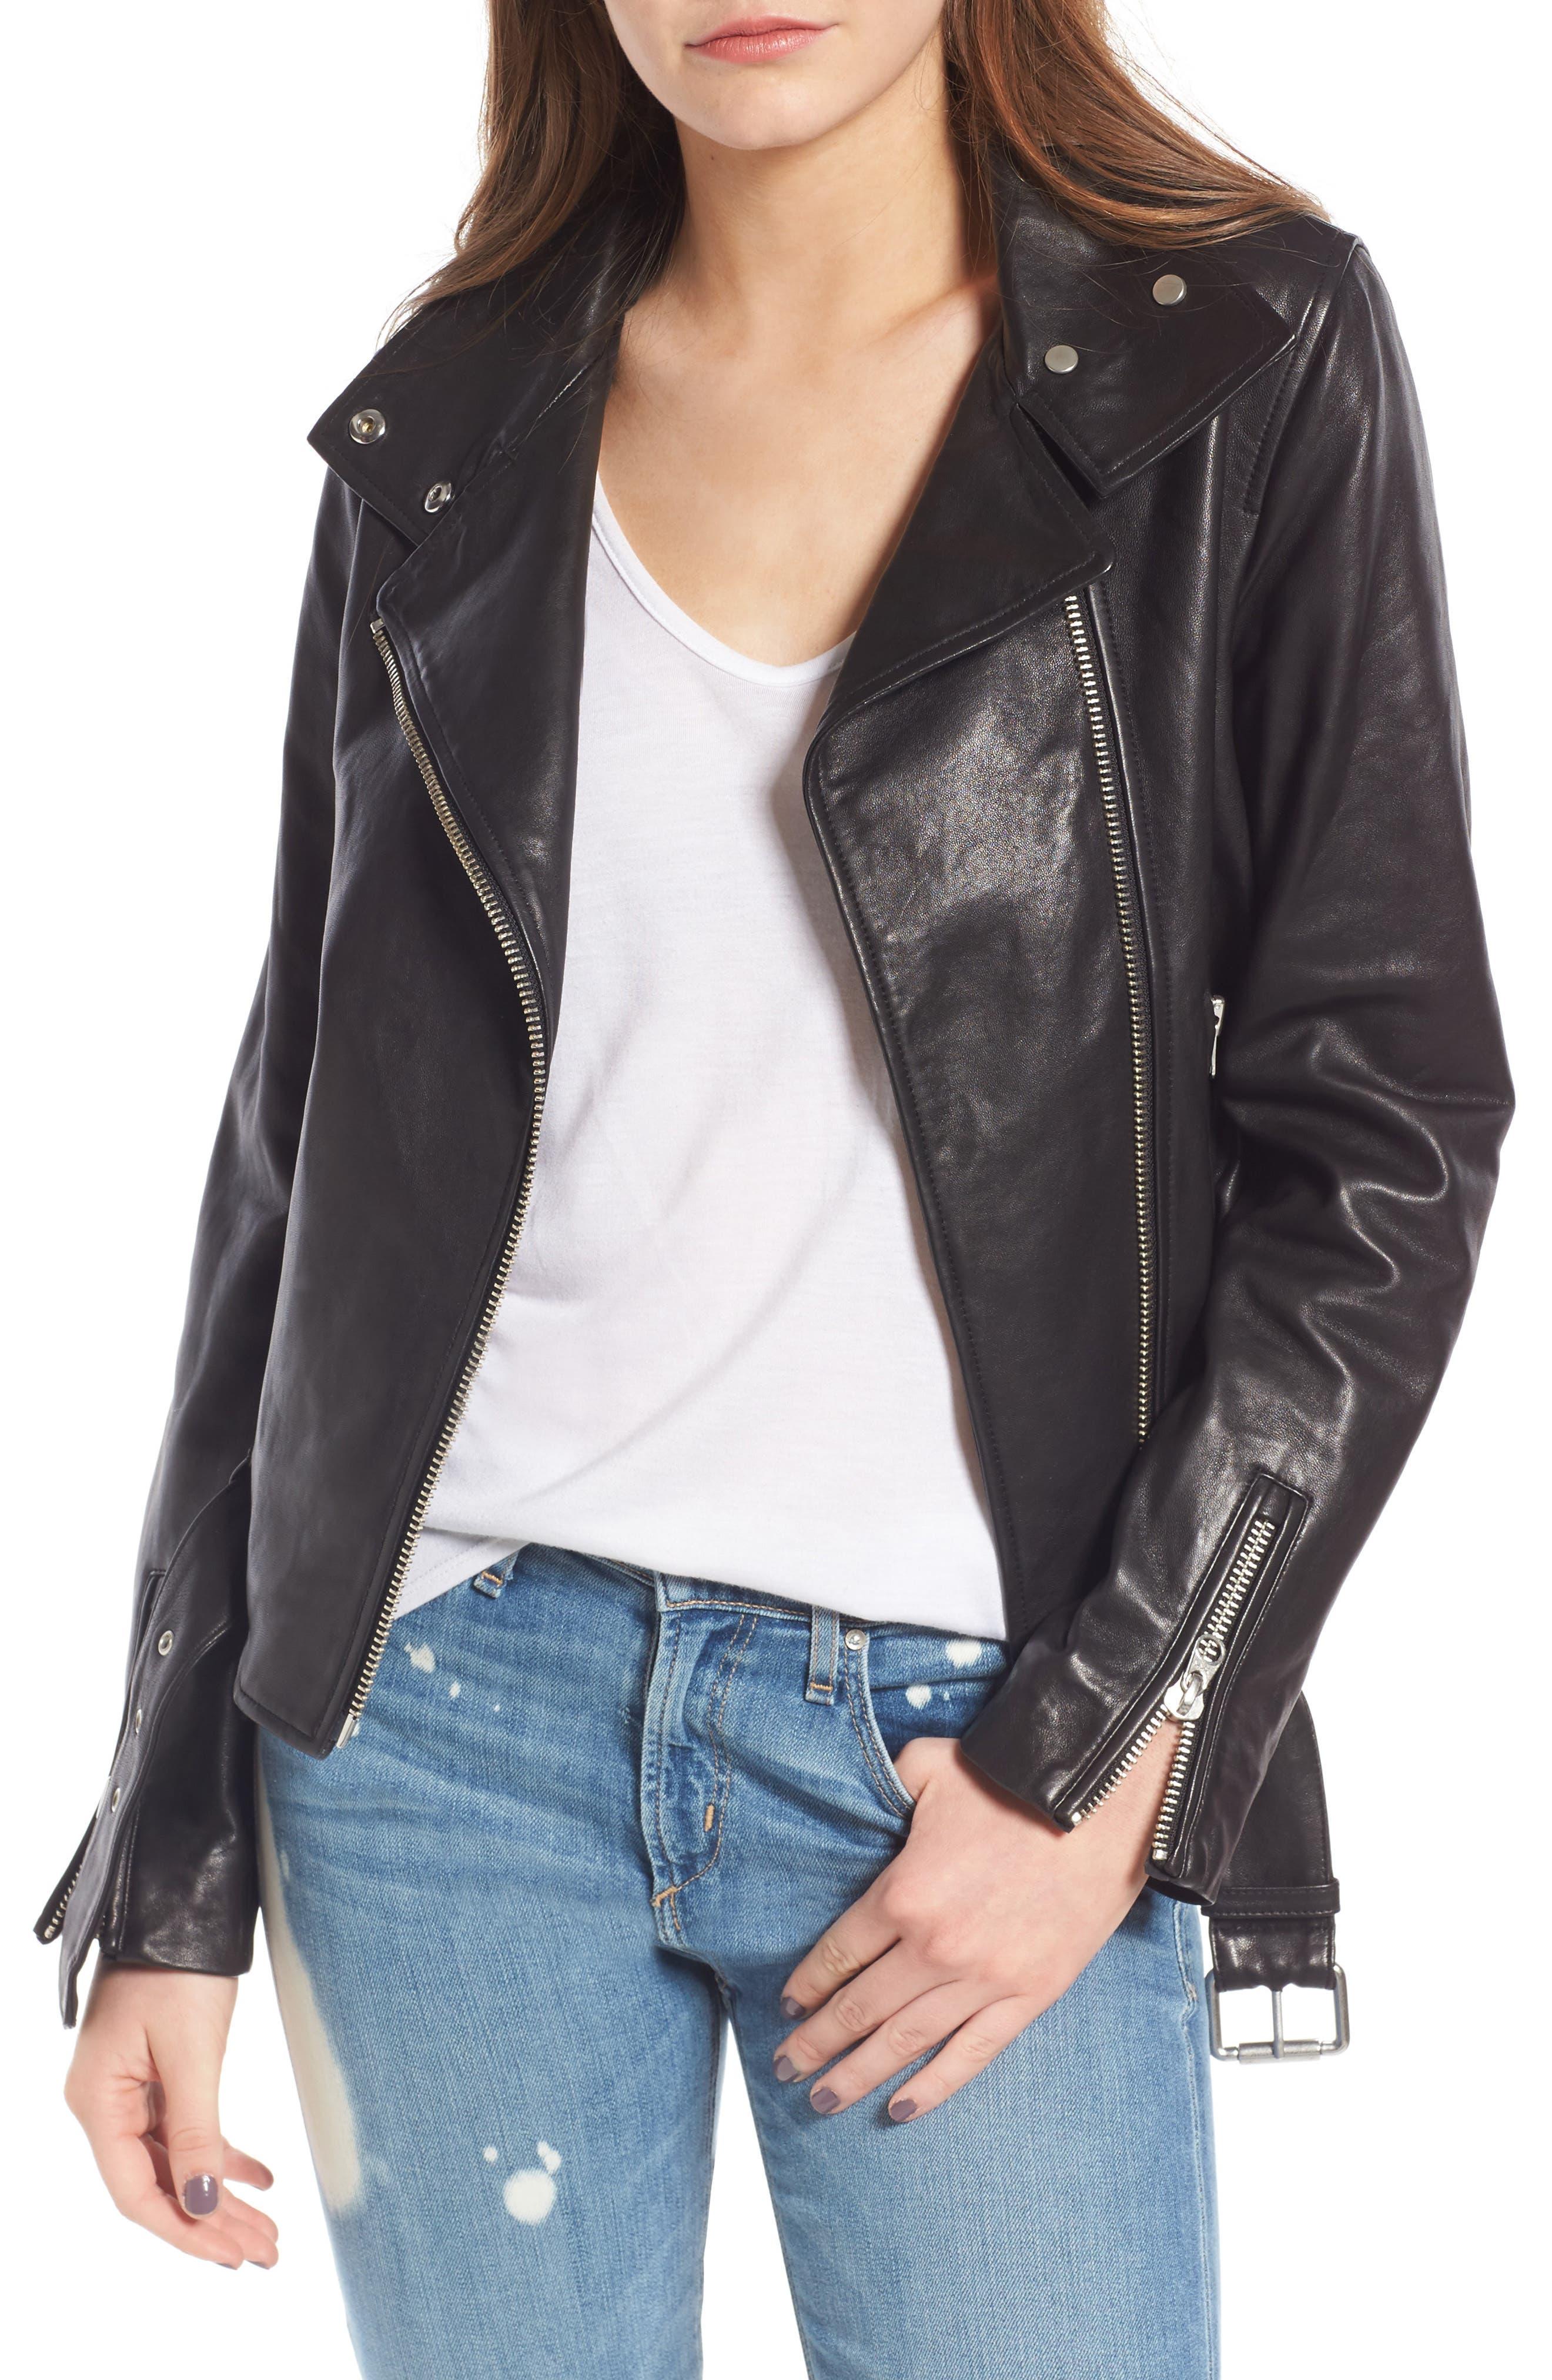 Miela-N Belted Leather Moto Jacket,                             Main thumbnail 1, color,                             001